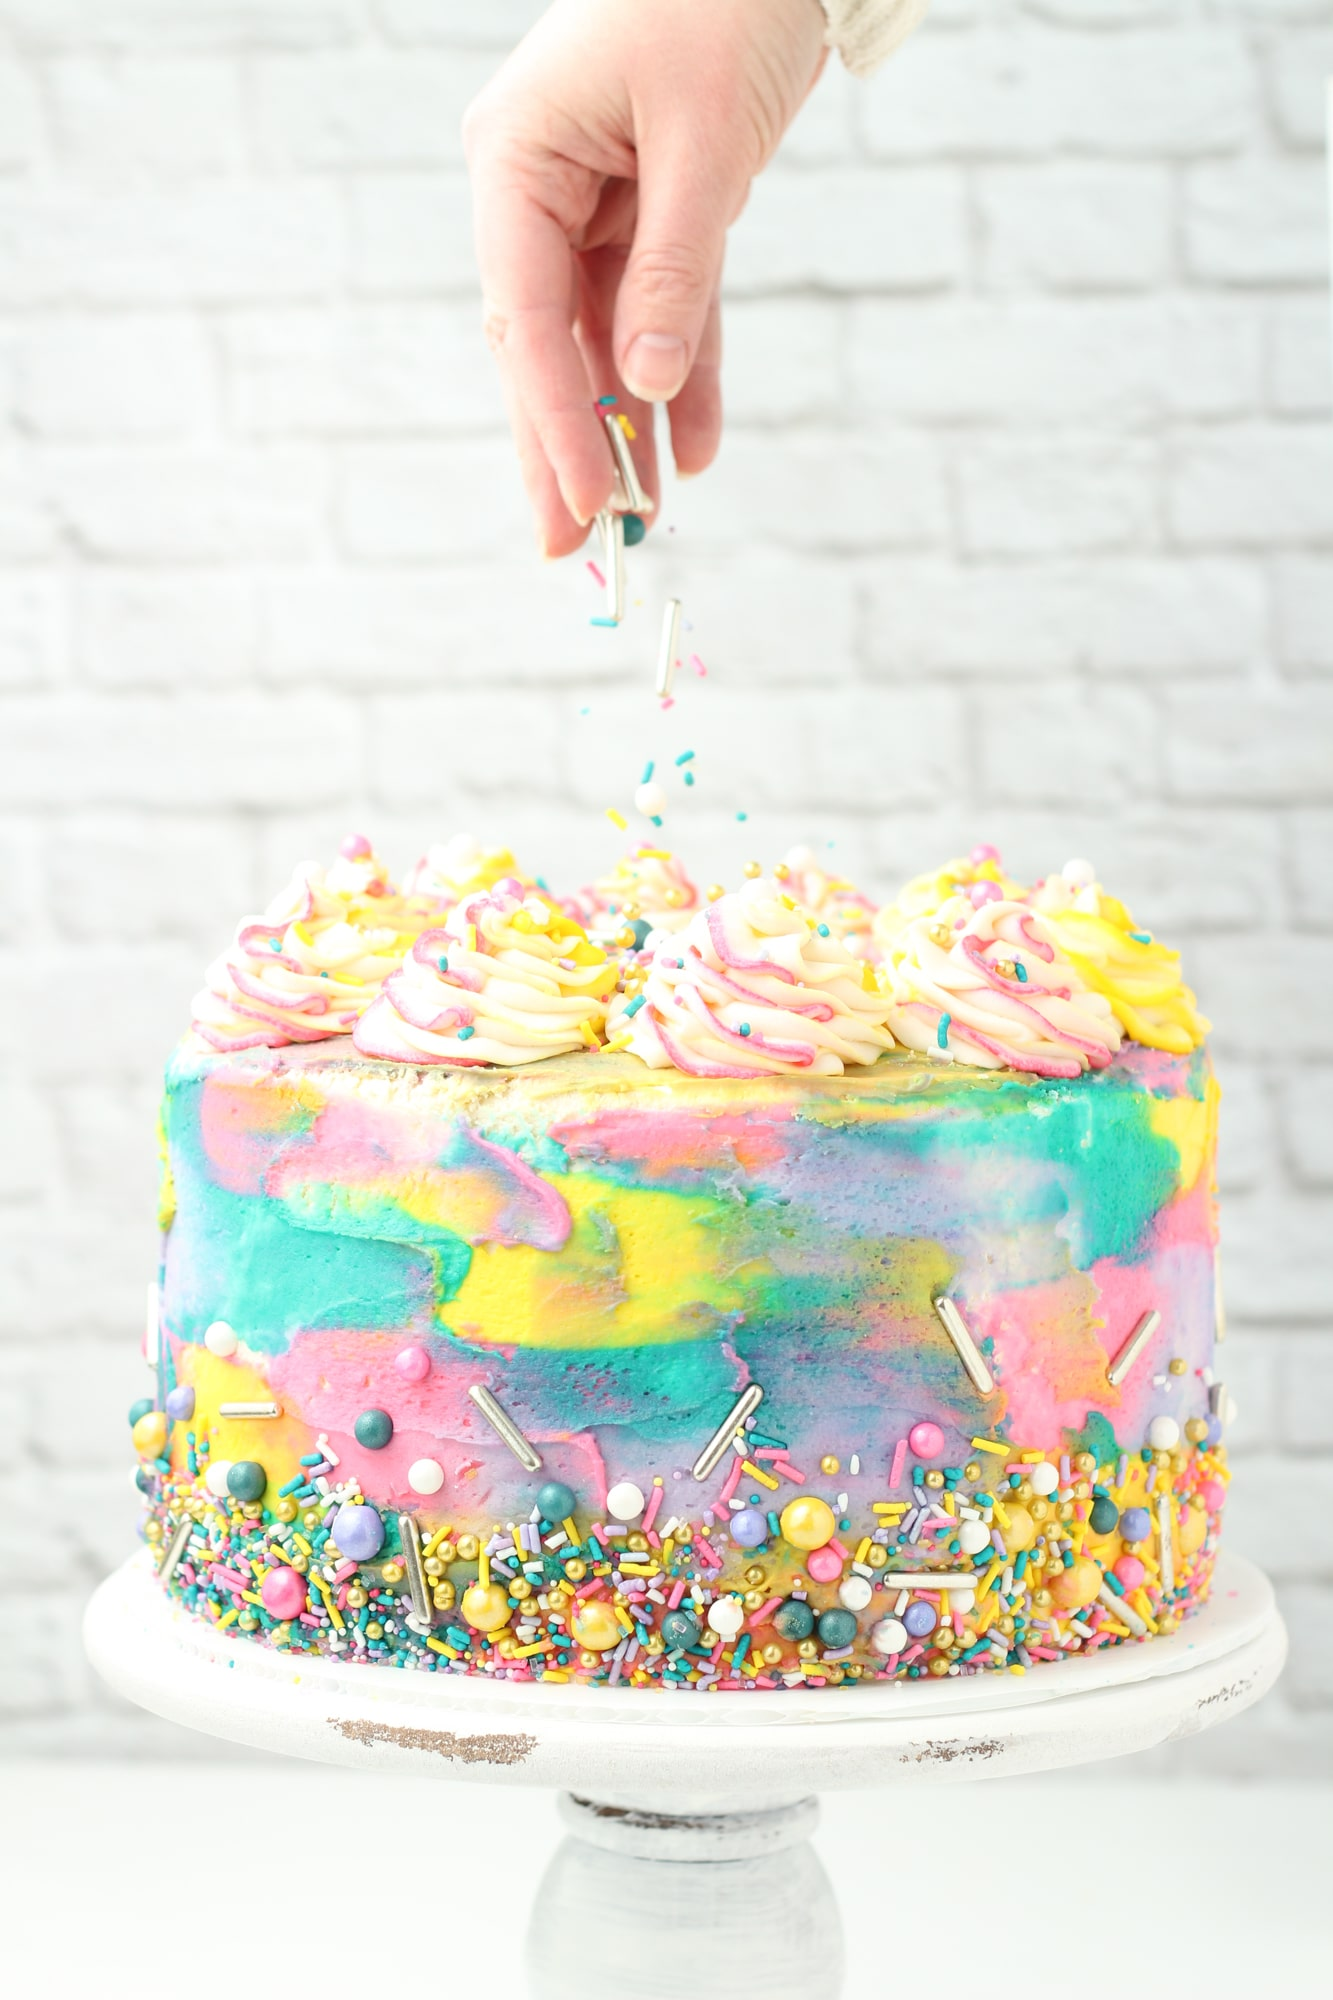 Pleasing Pink Lemonade Cake The Saucy Fig Funny Birthday Cards Online Drosicarndamsfinfo